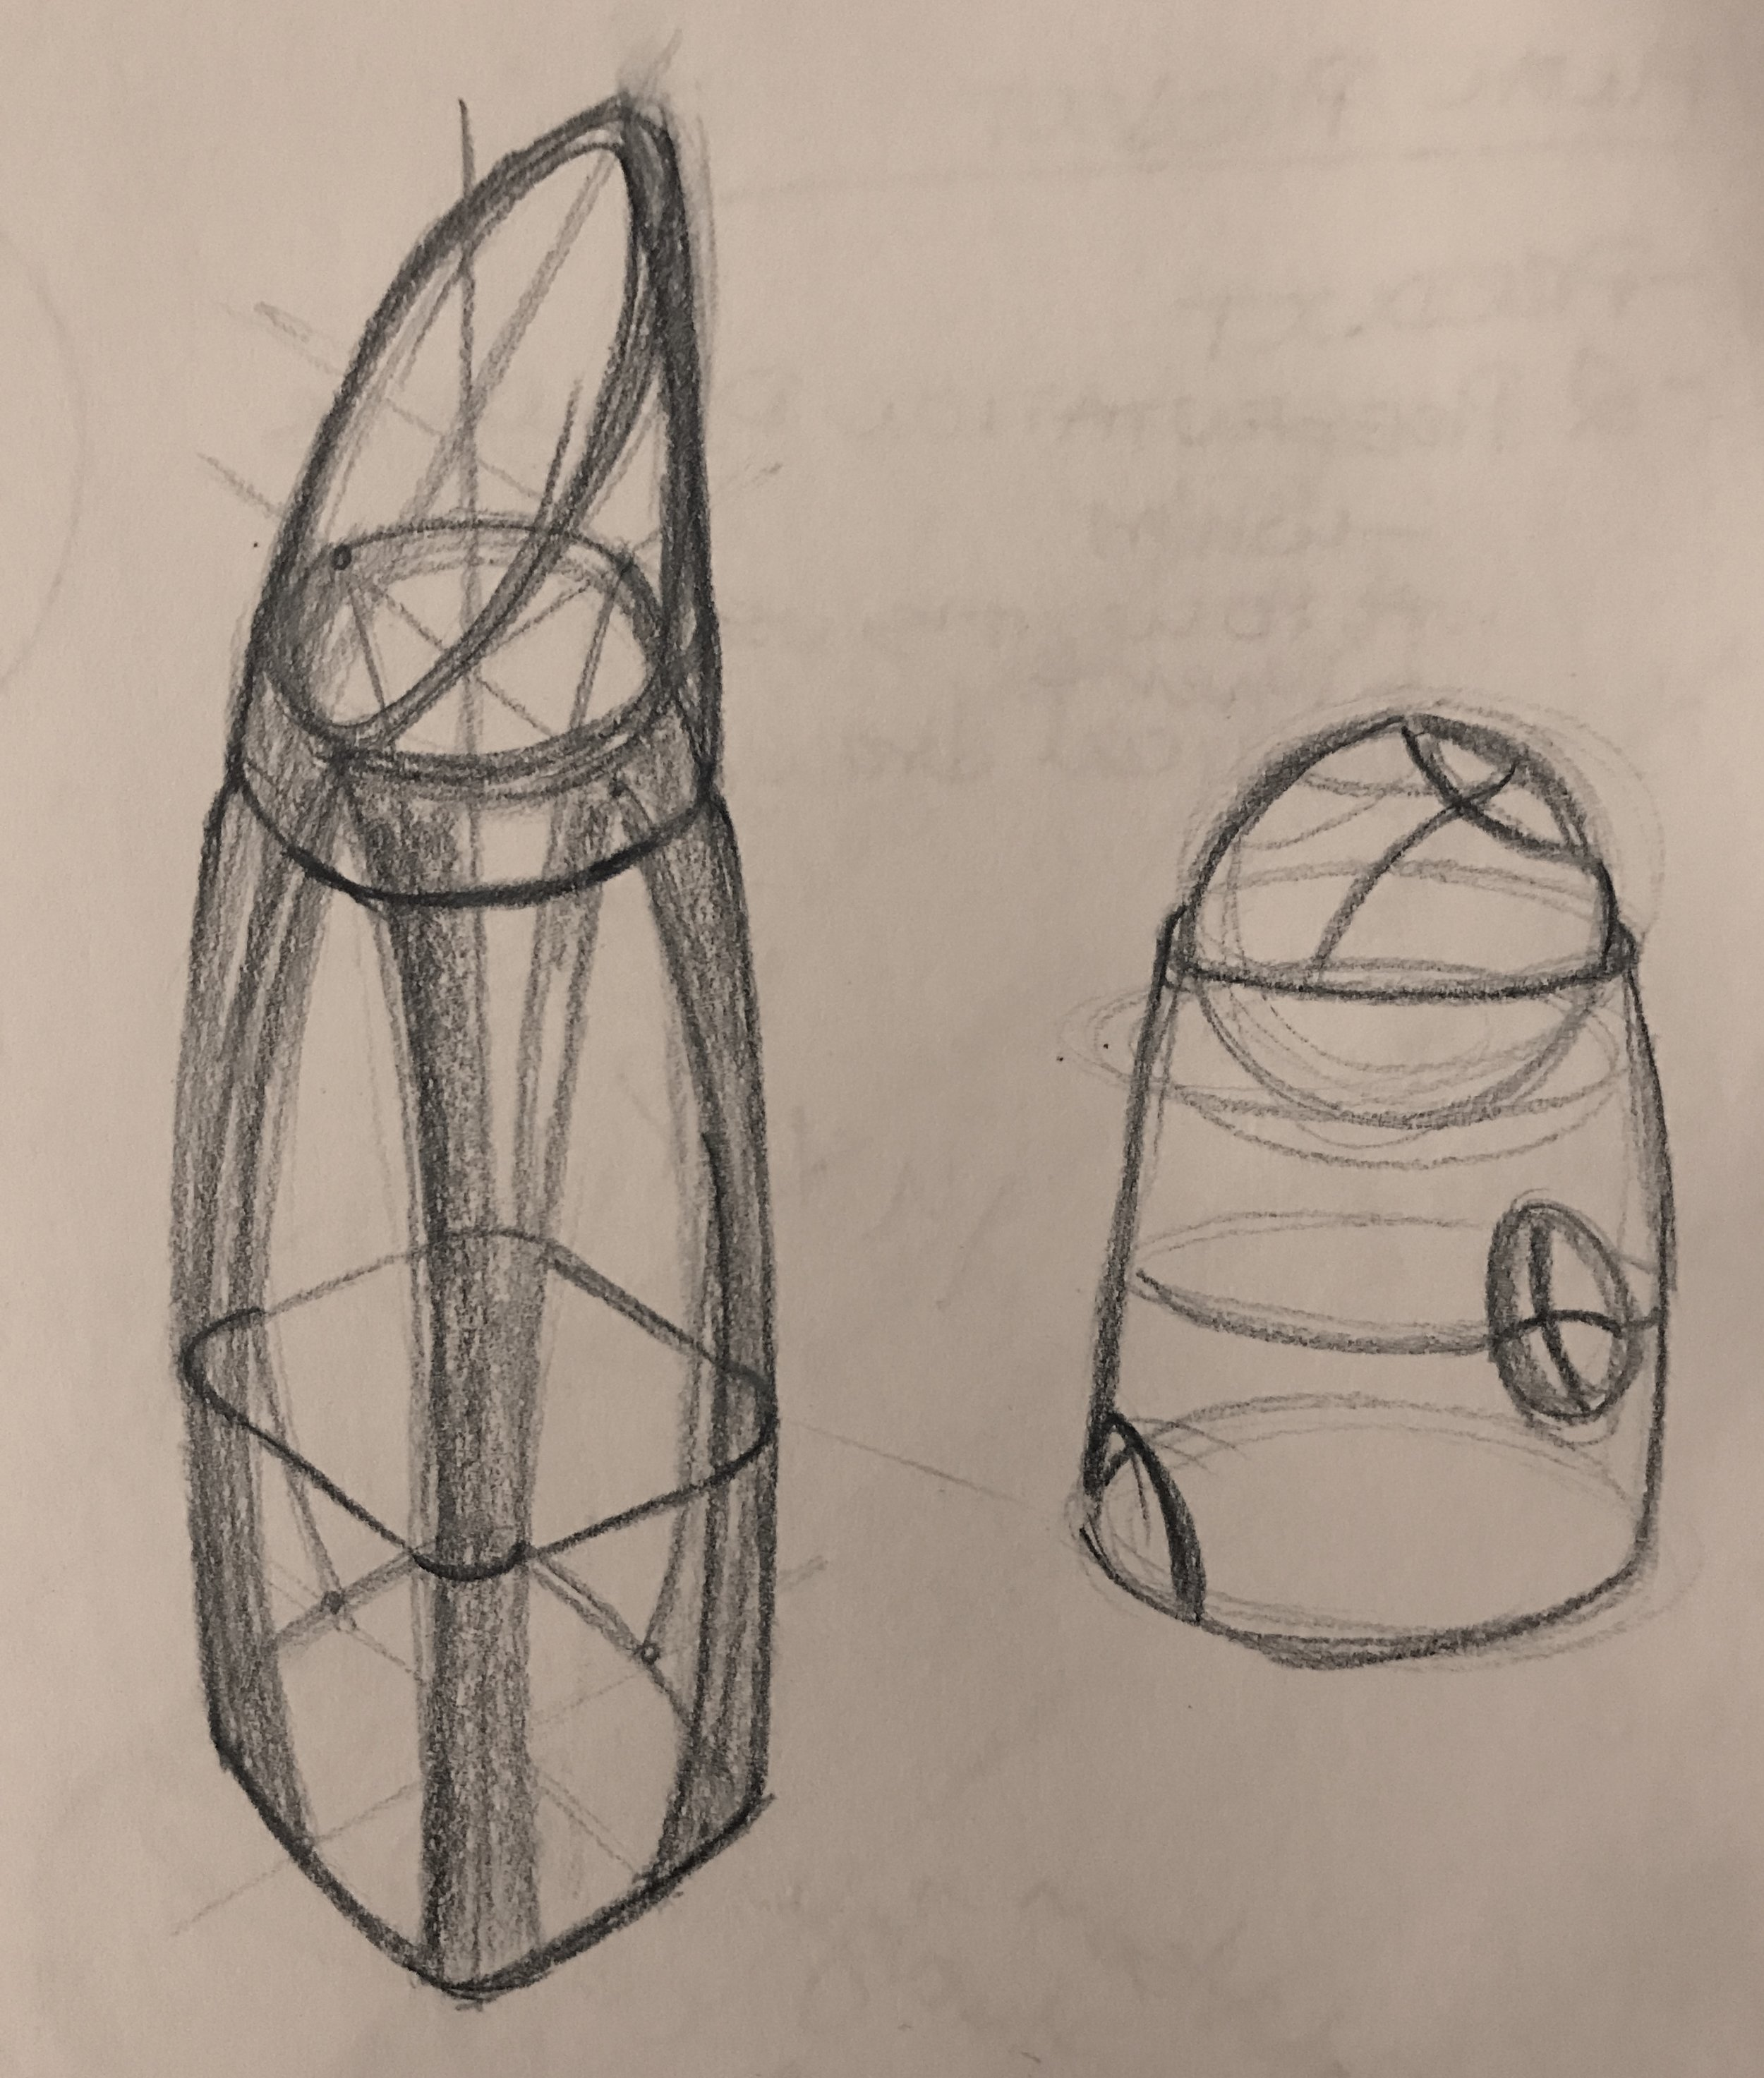 Perfume bottle sketches